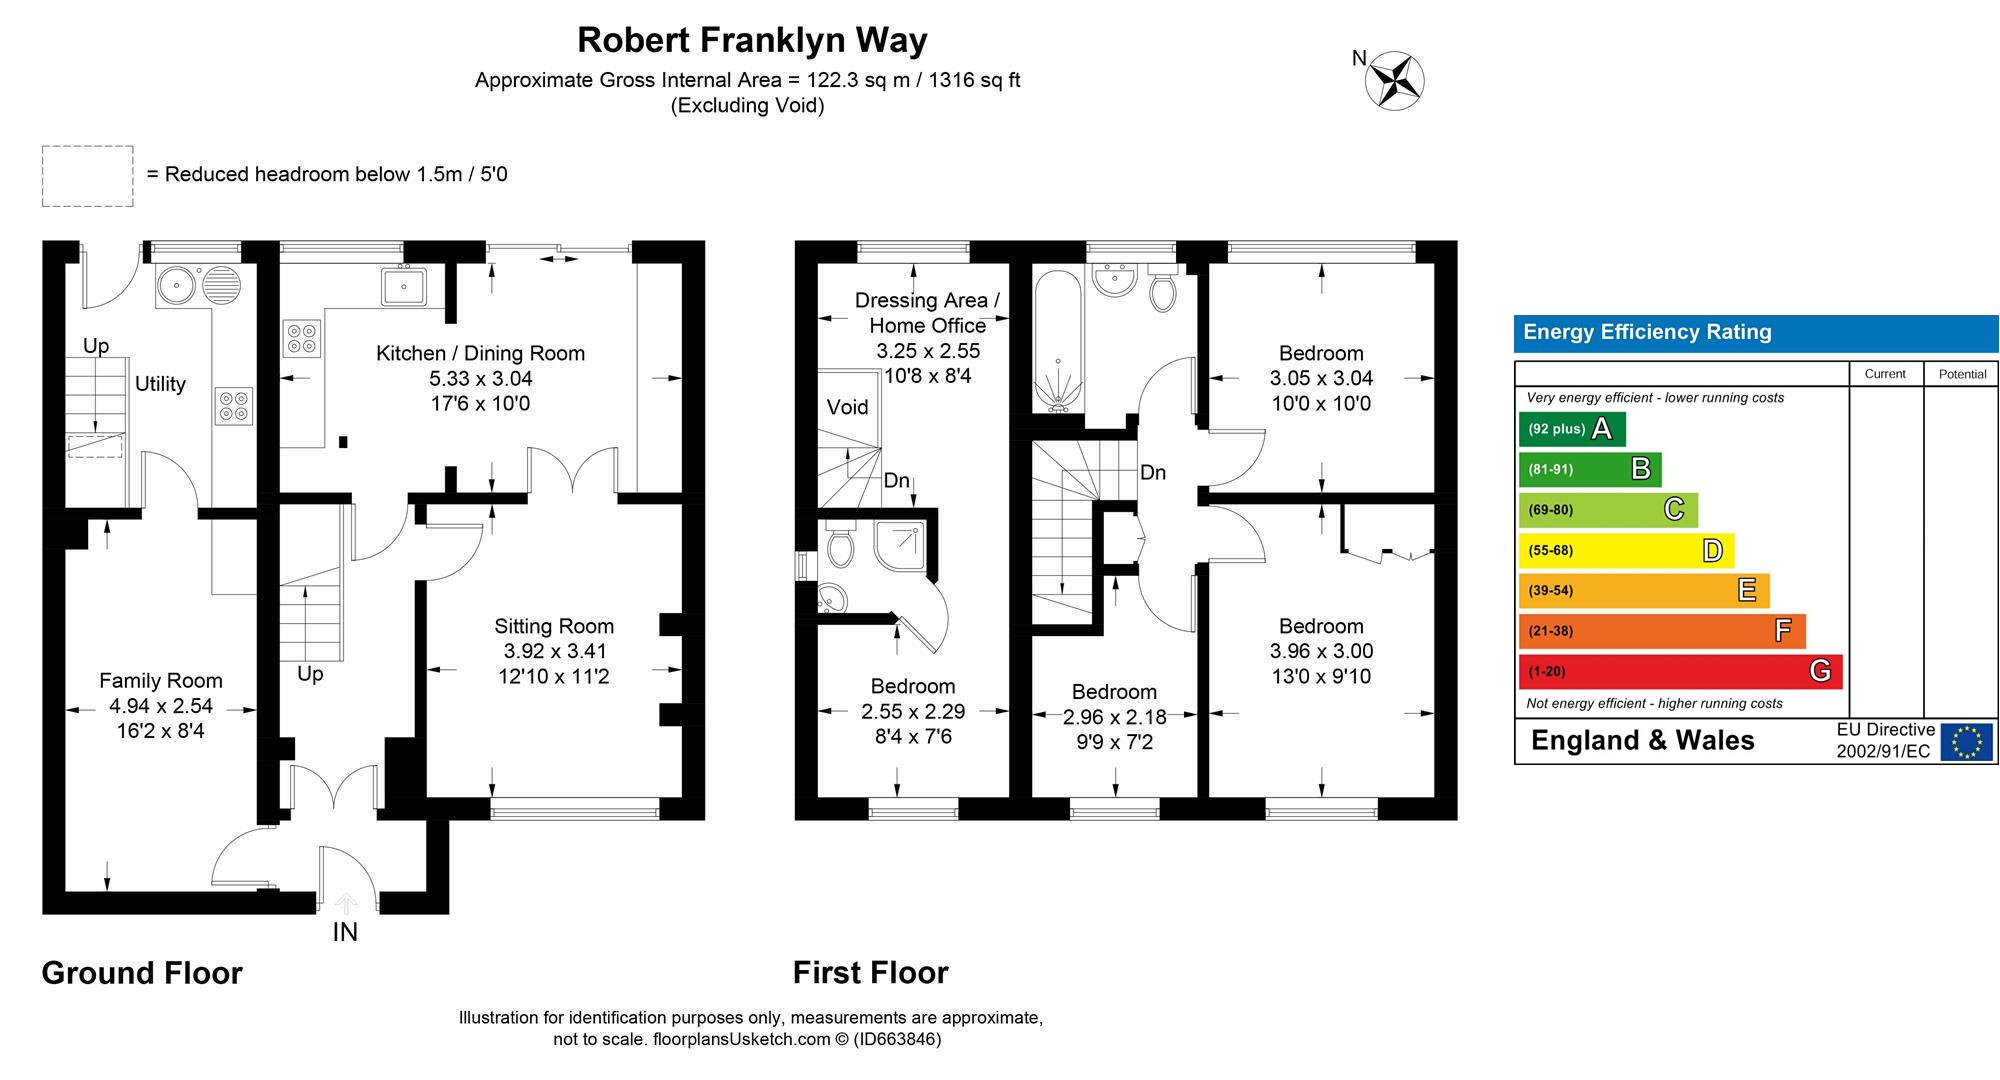 details of 7 RFW